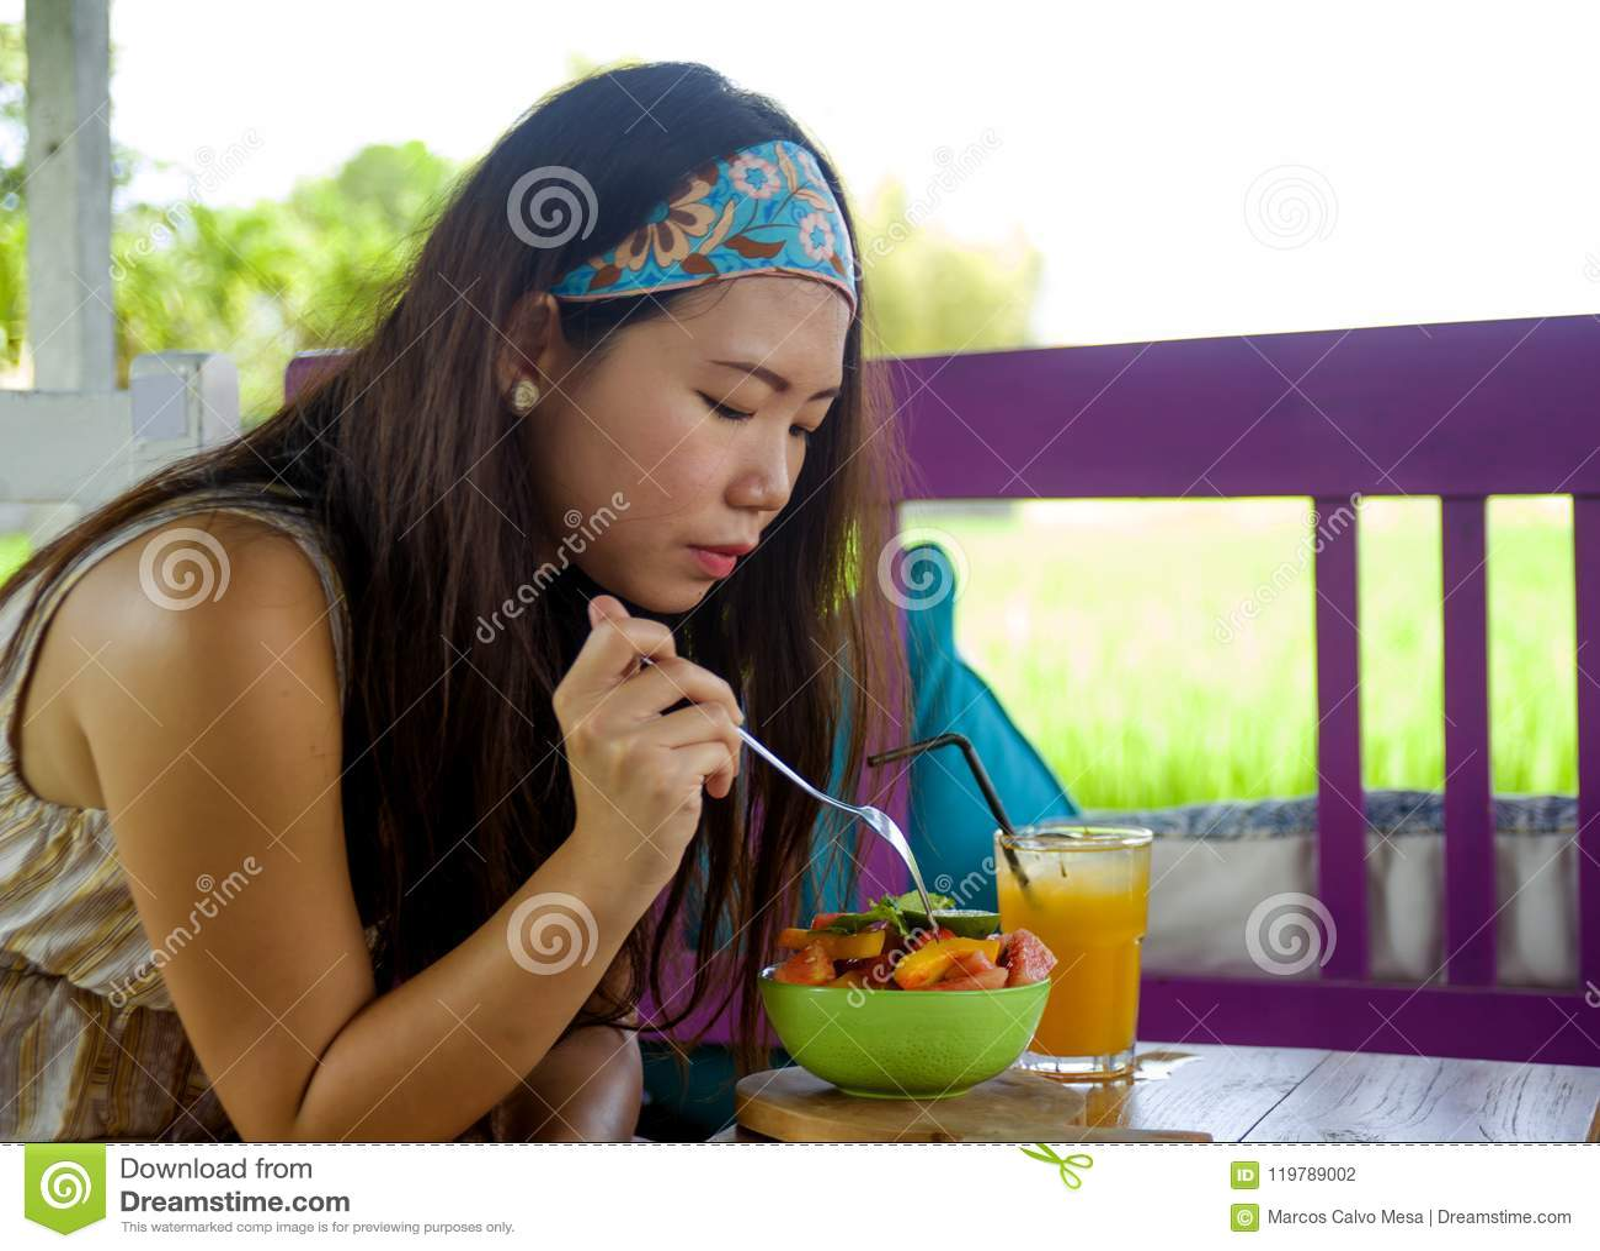 Young beautiful and happy Asian Korean woman drinking orange juice eating healthy salad at organic food coffee shop outdoors enjoy